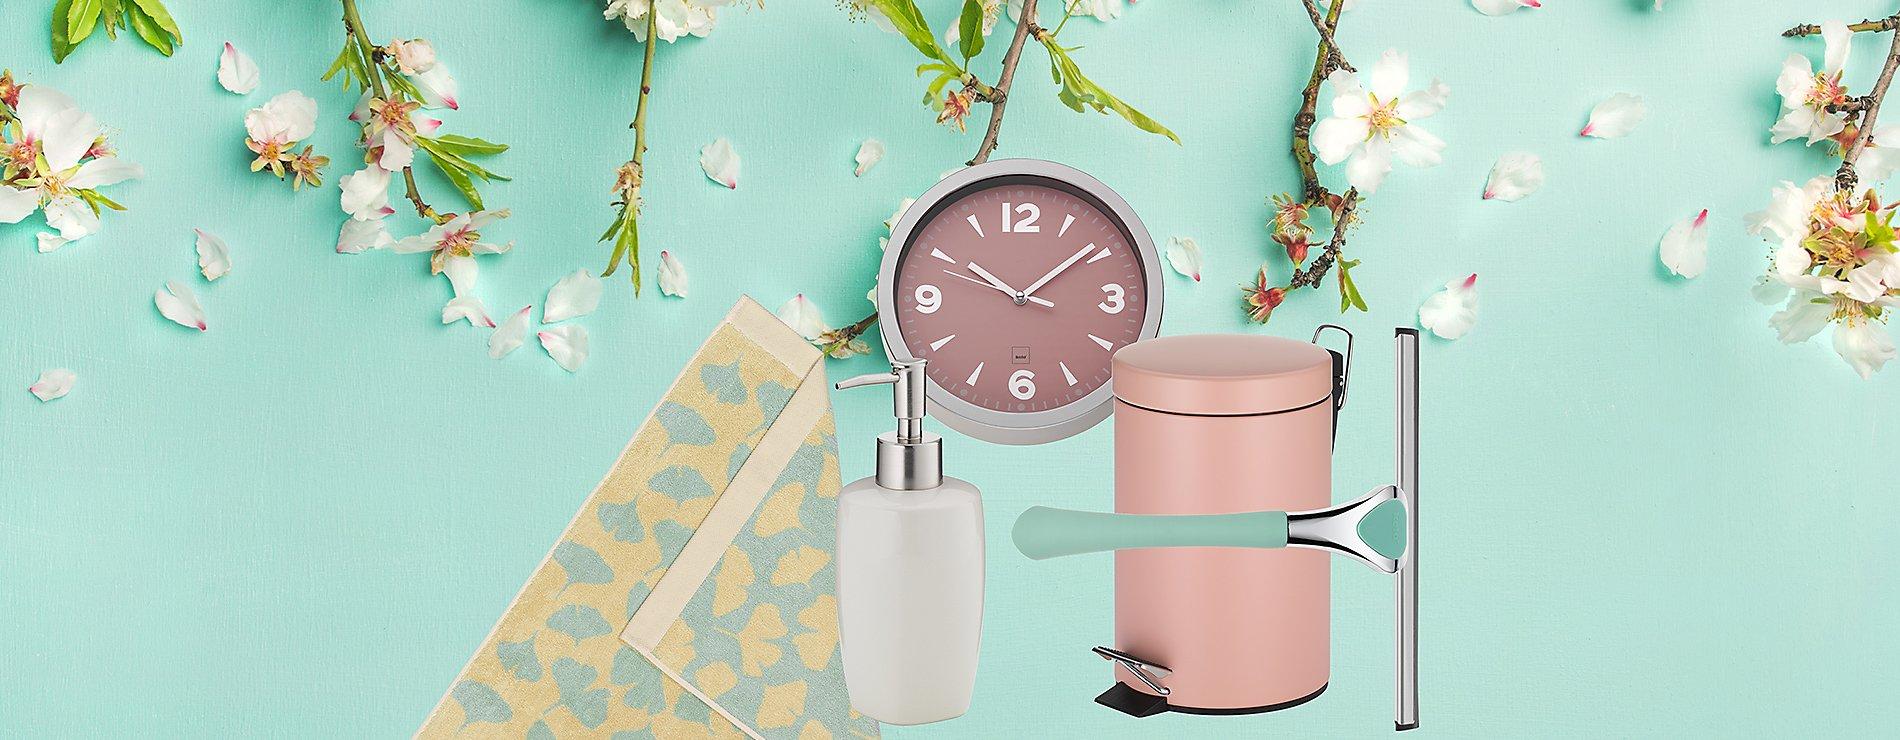 Inspirationen Handtücher Seifenspender Pastell